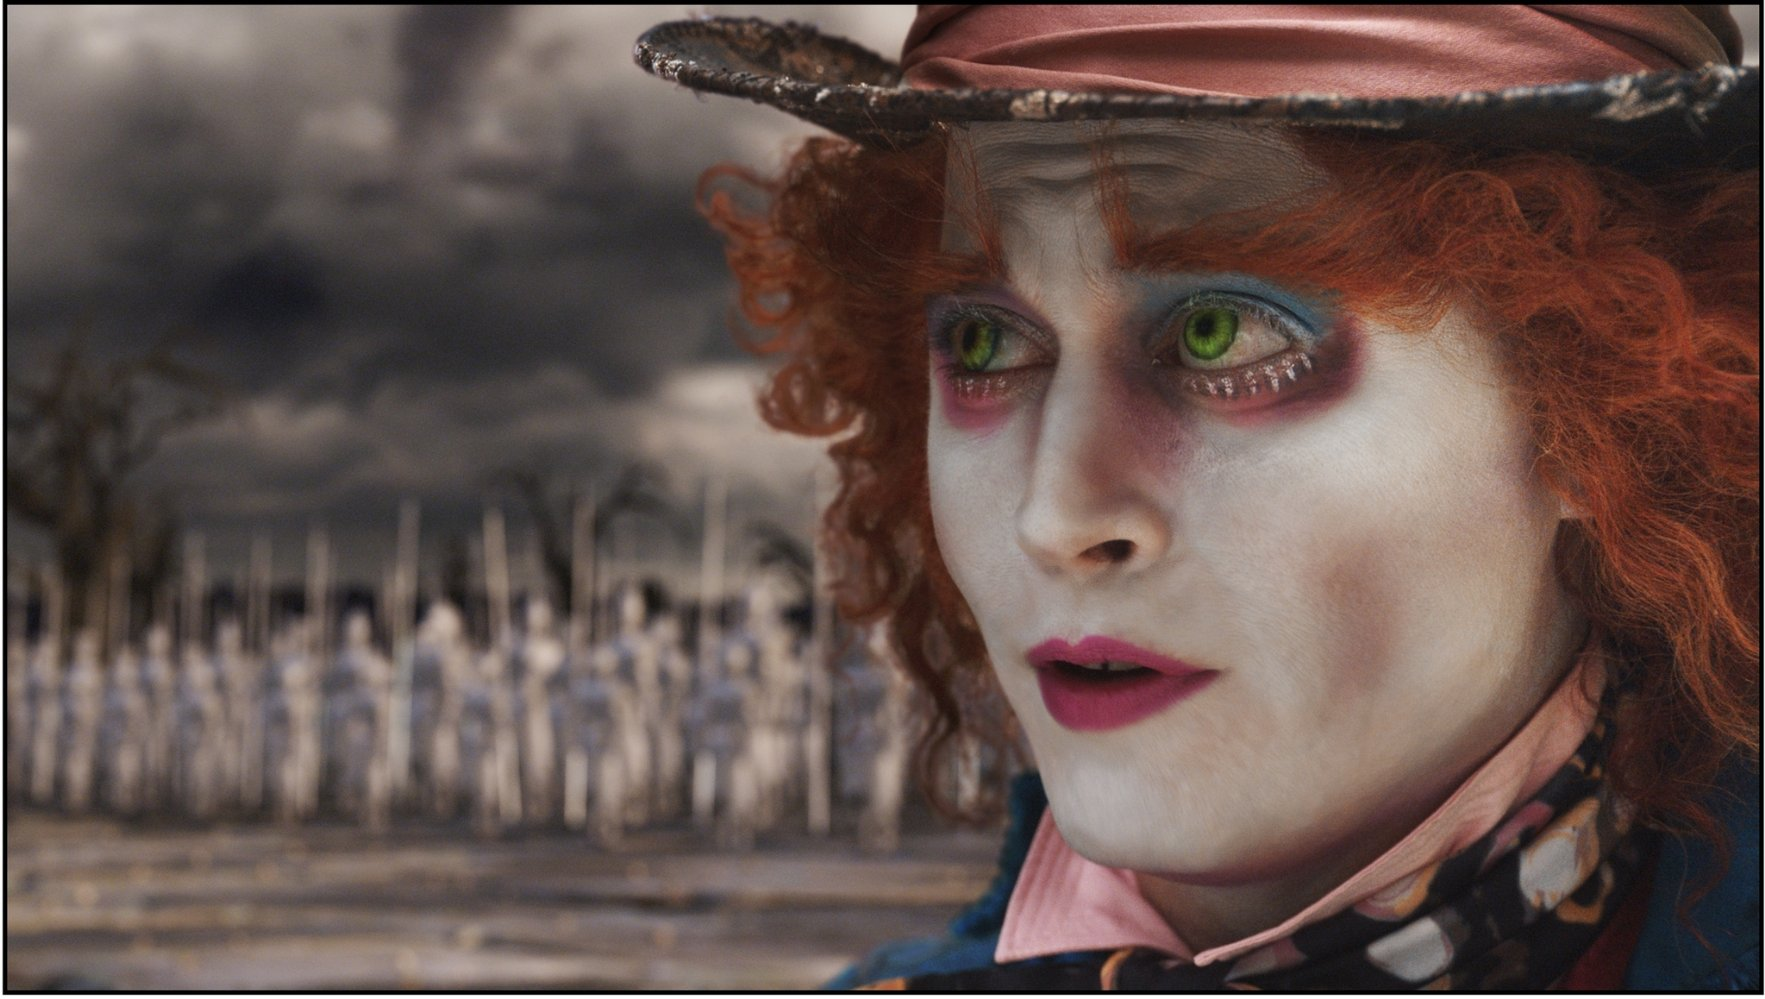 電影「 Alice in Wonderland 」中的瘋帽子先生